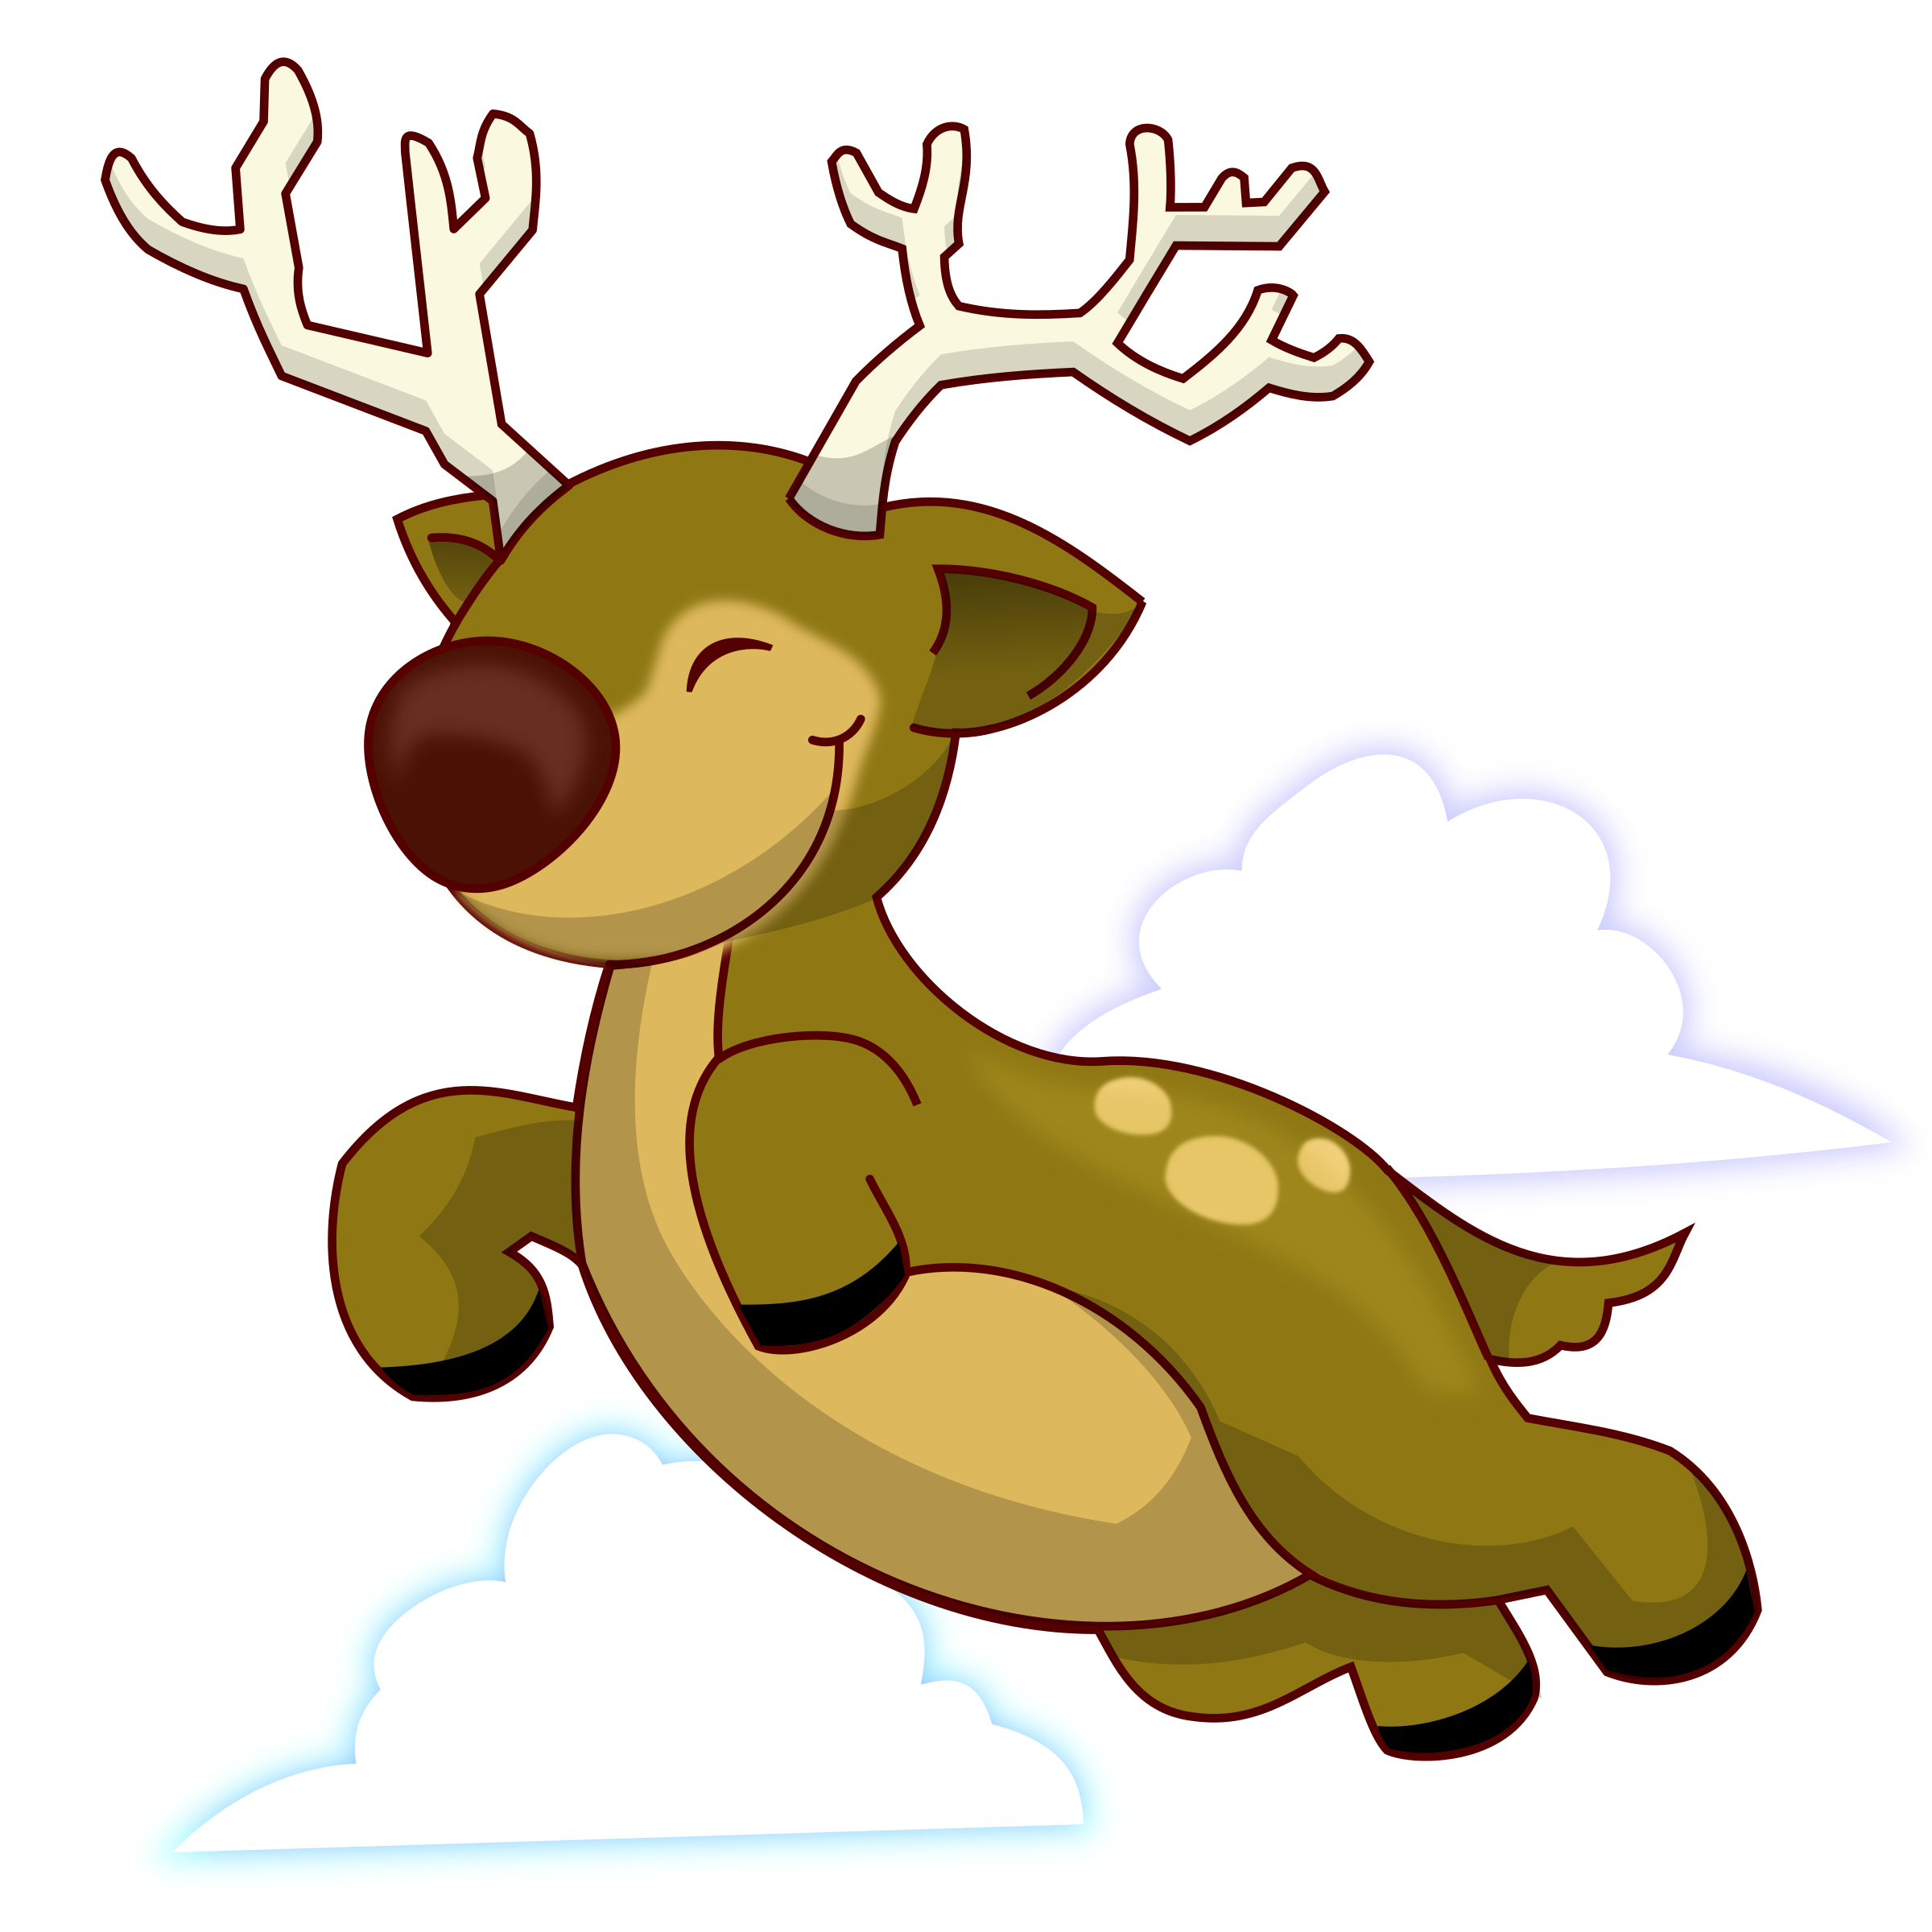 Flying big image png. Clipart reindeer easy